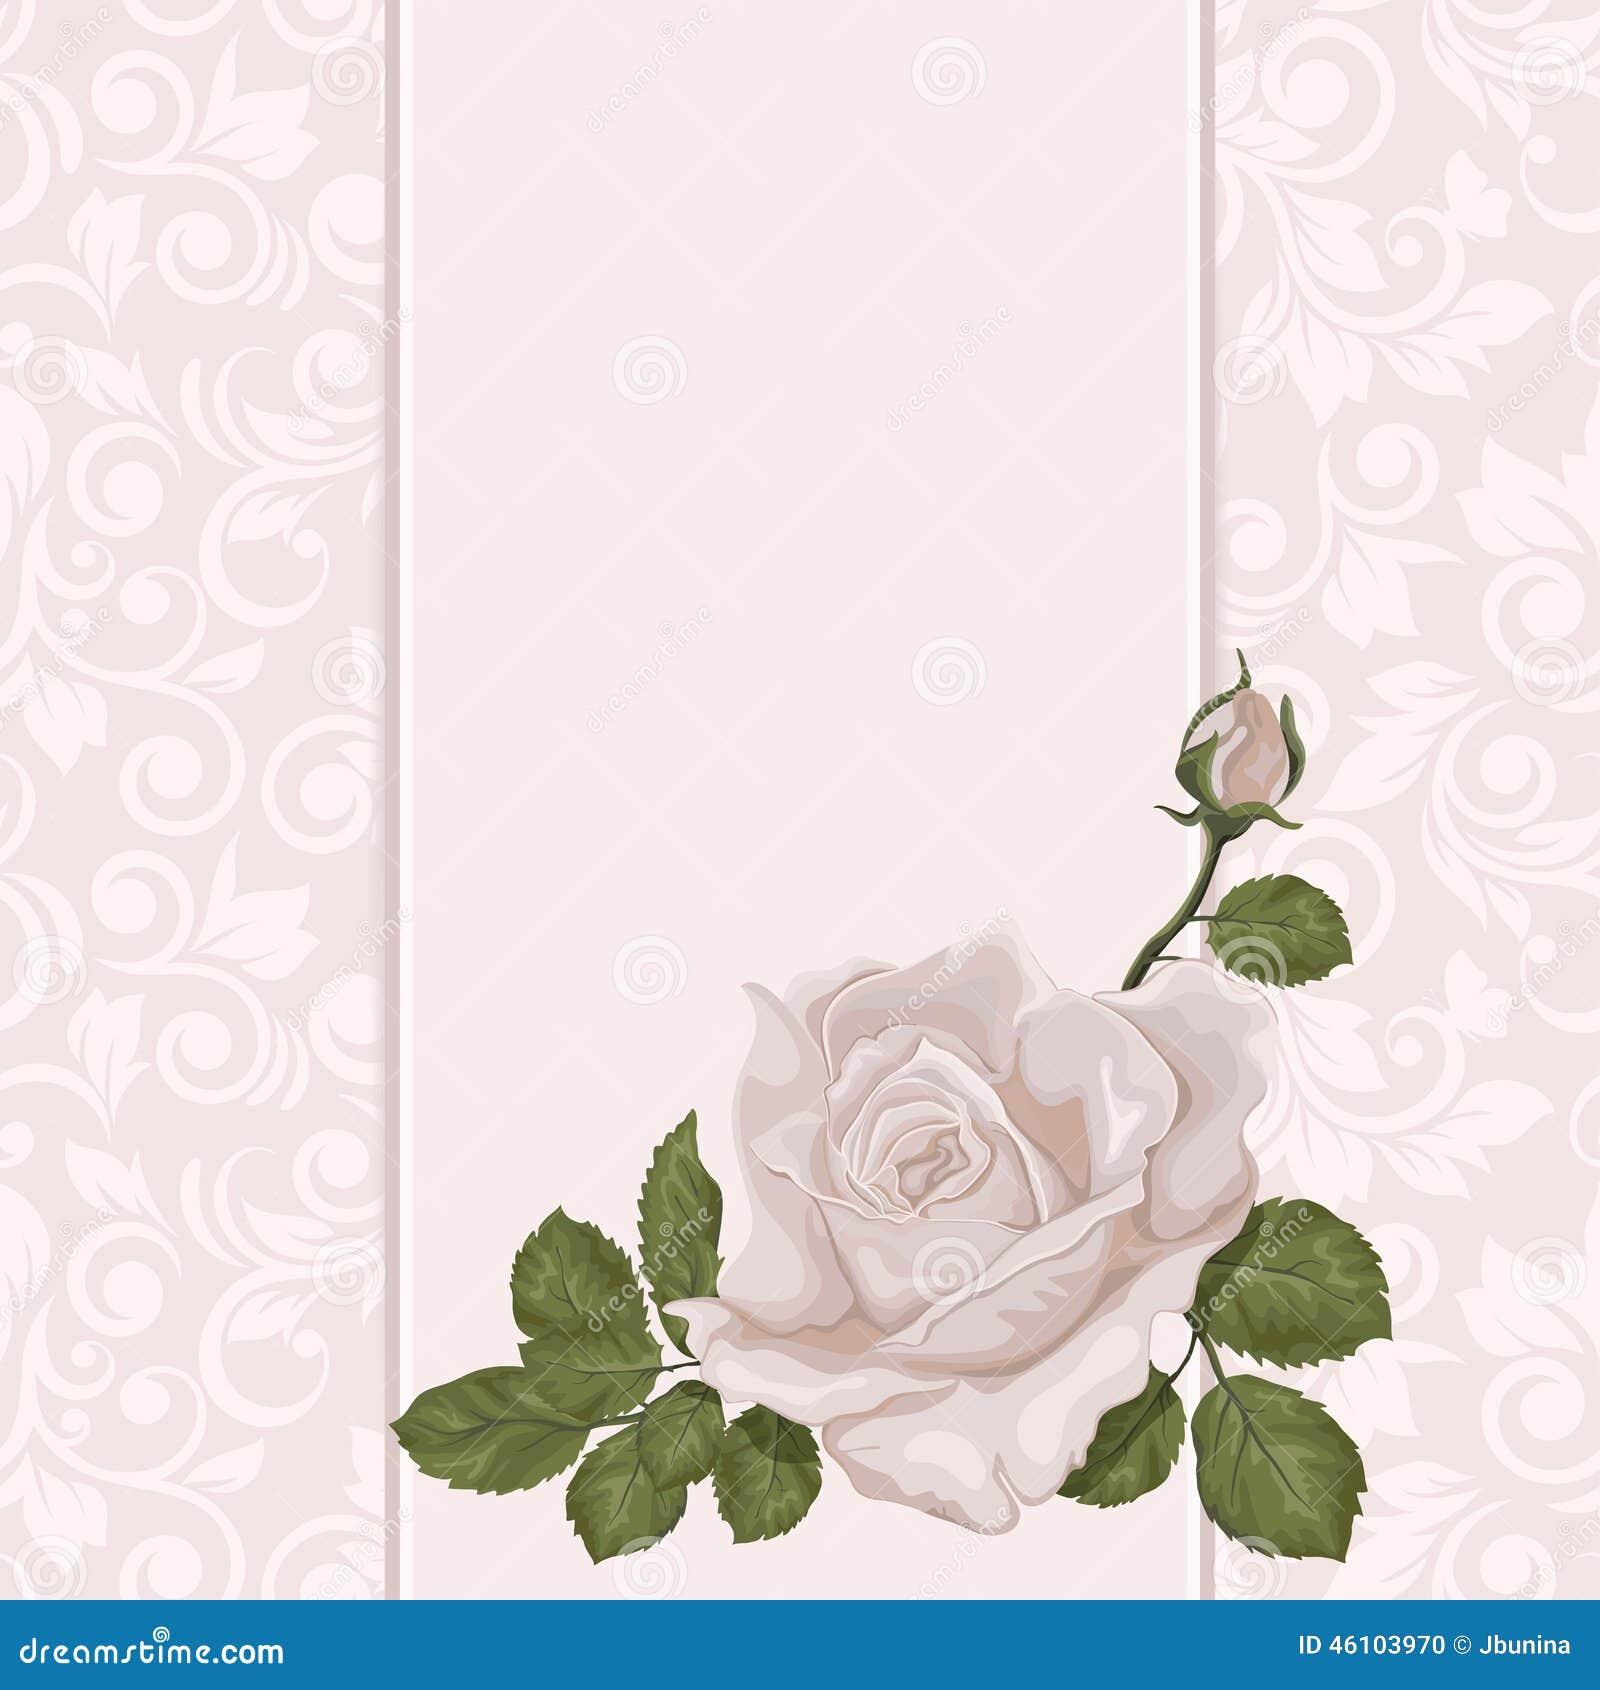 Wedding Invitation Card Stock for great invitation layout